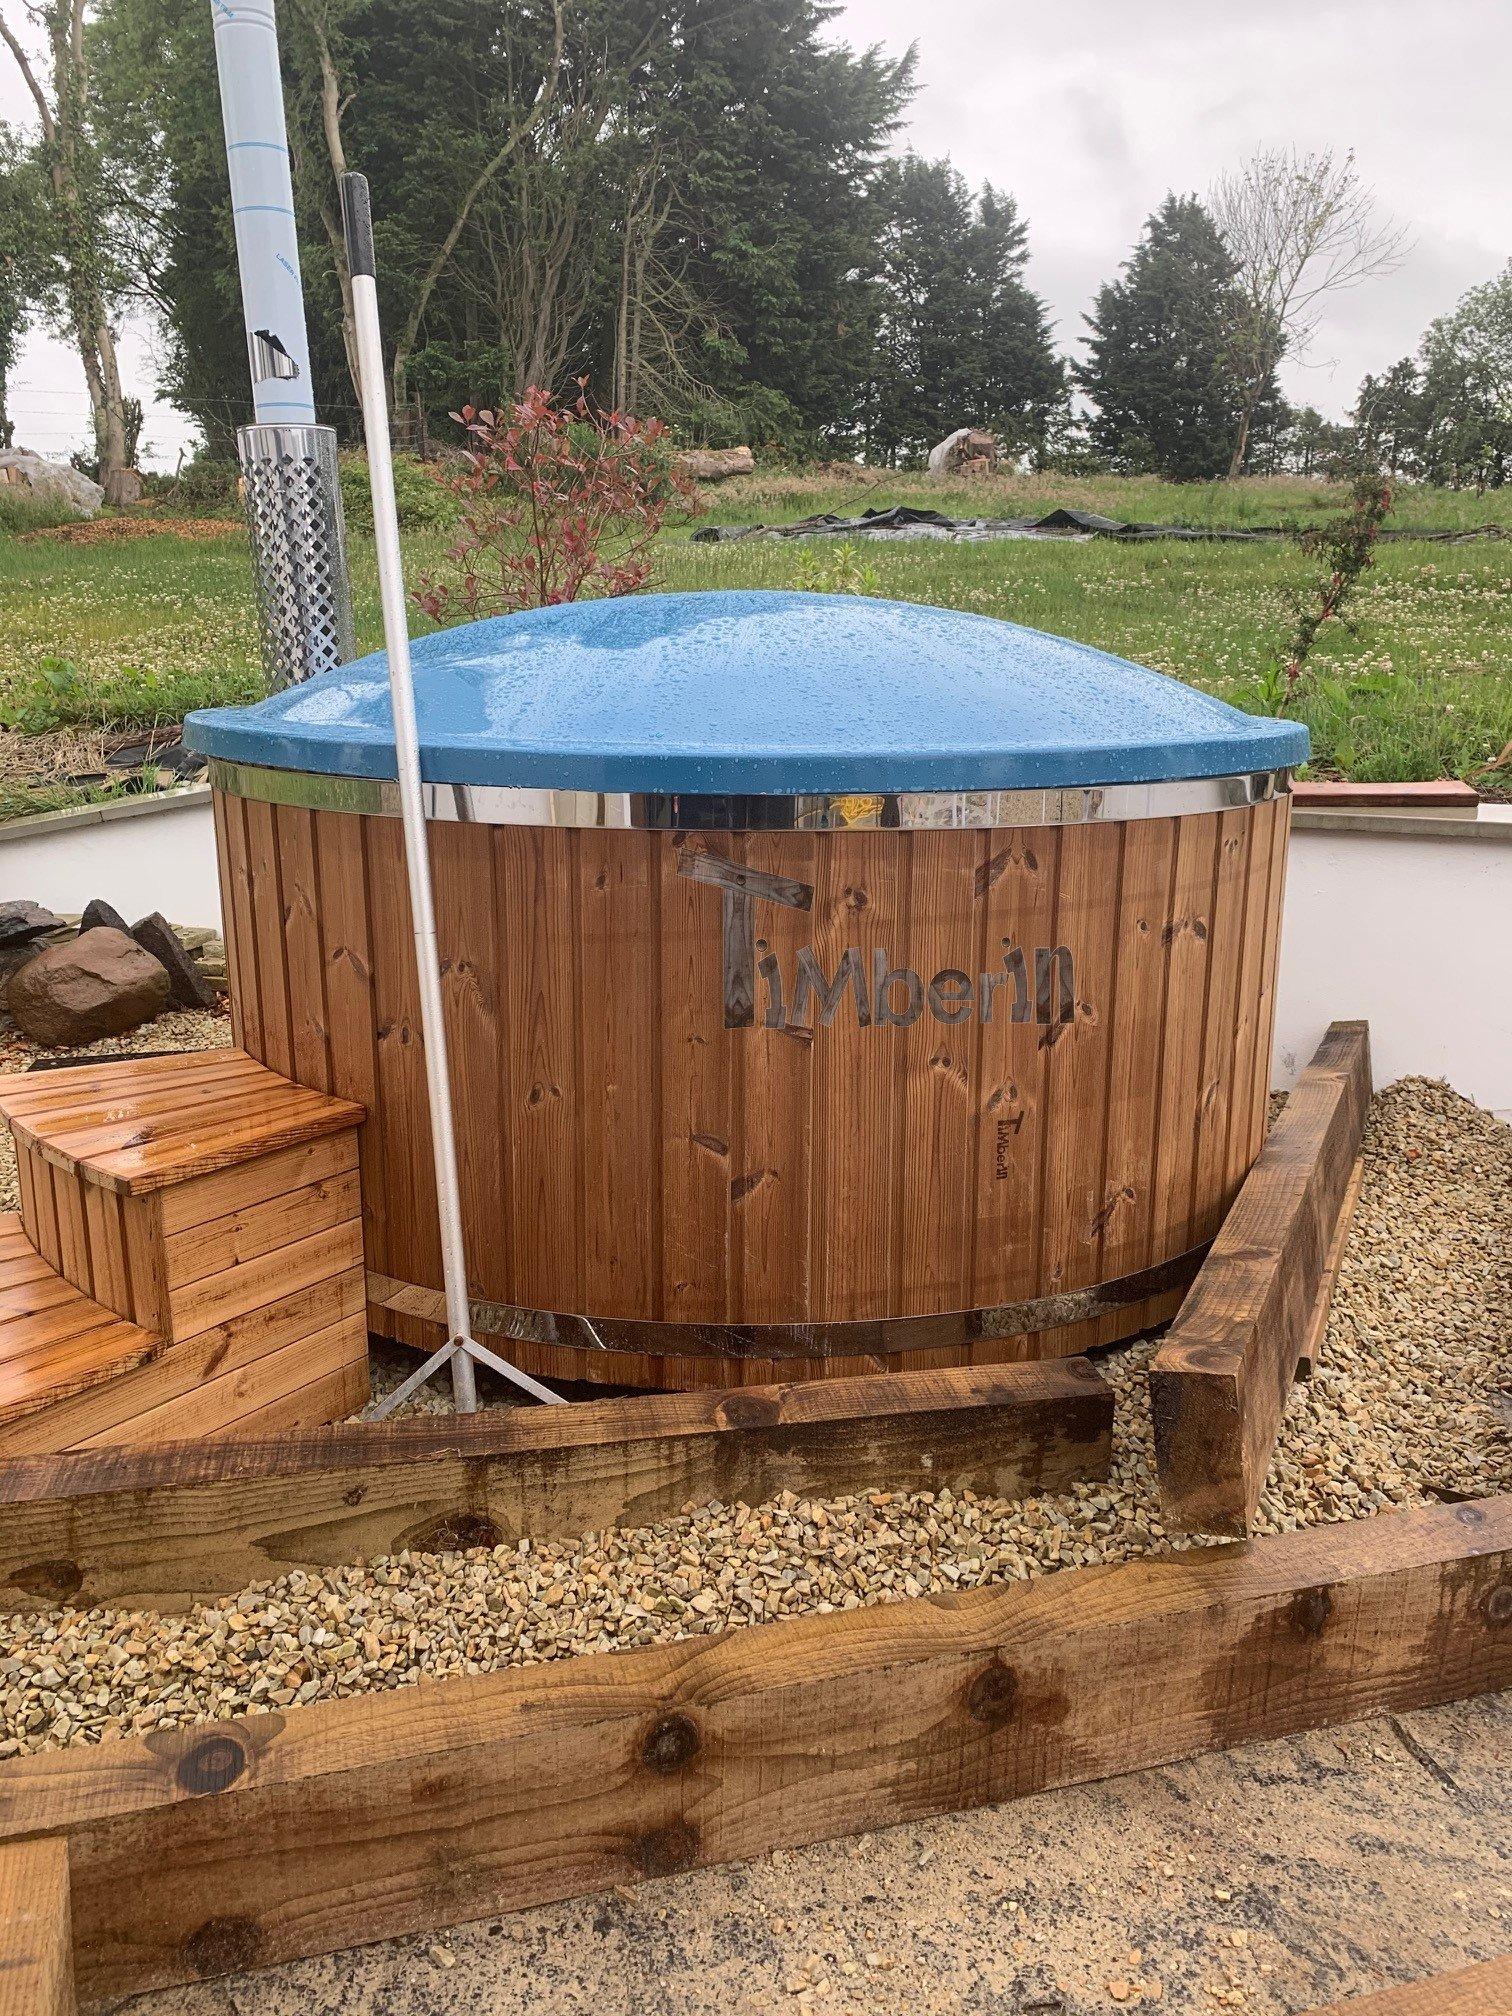 Wood burning fiberglass hot tub with jets Wellness Royal Rachel Lisburn United Kingdom